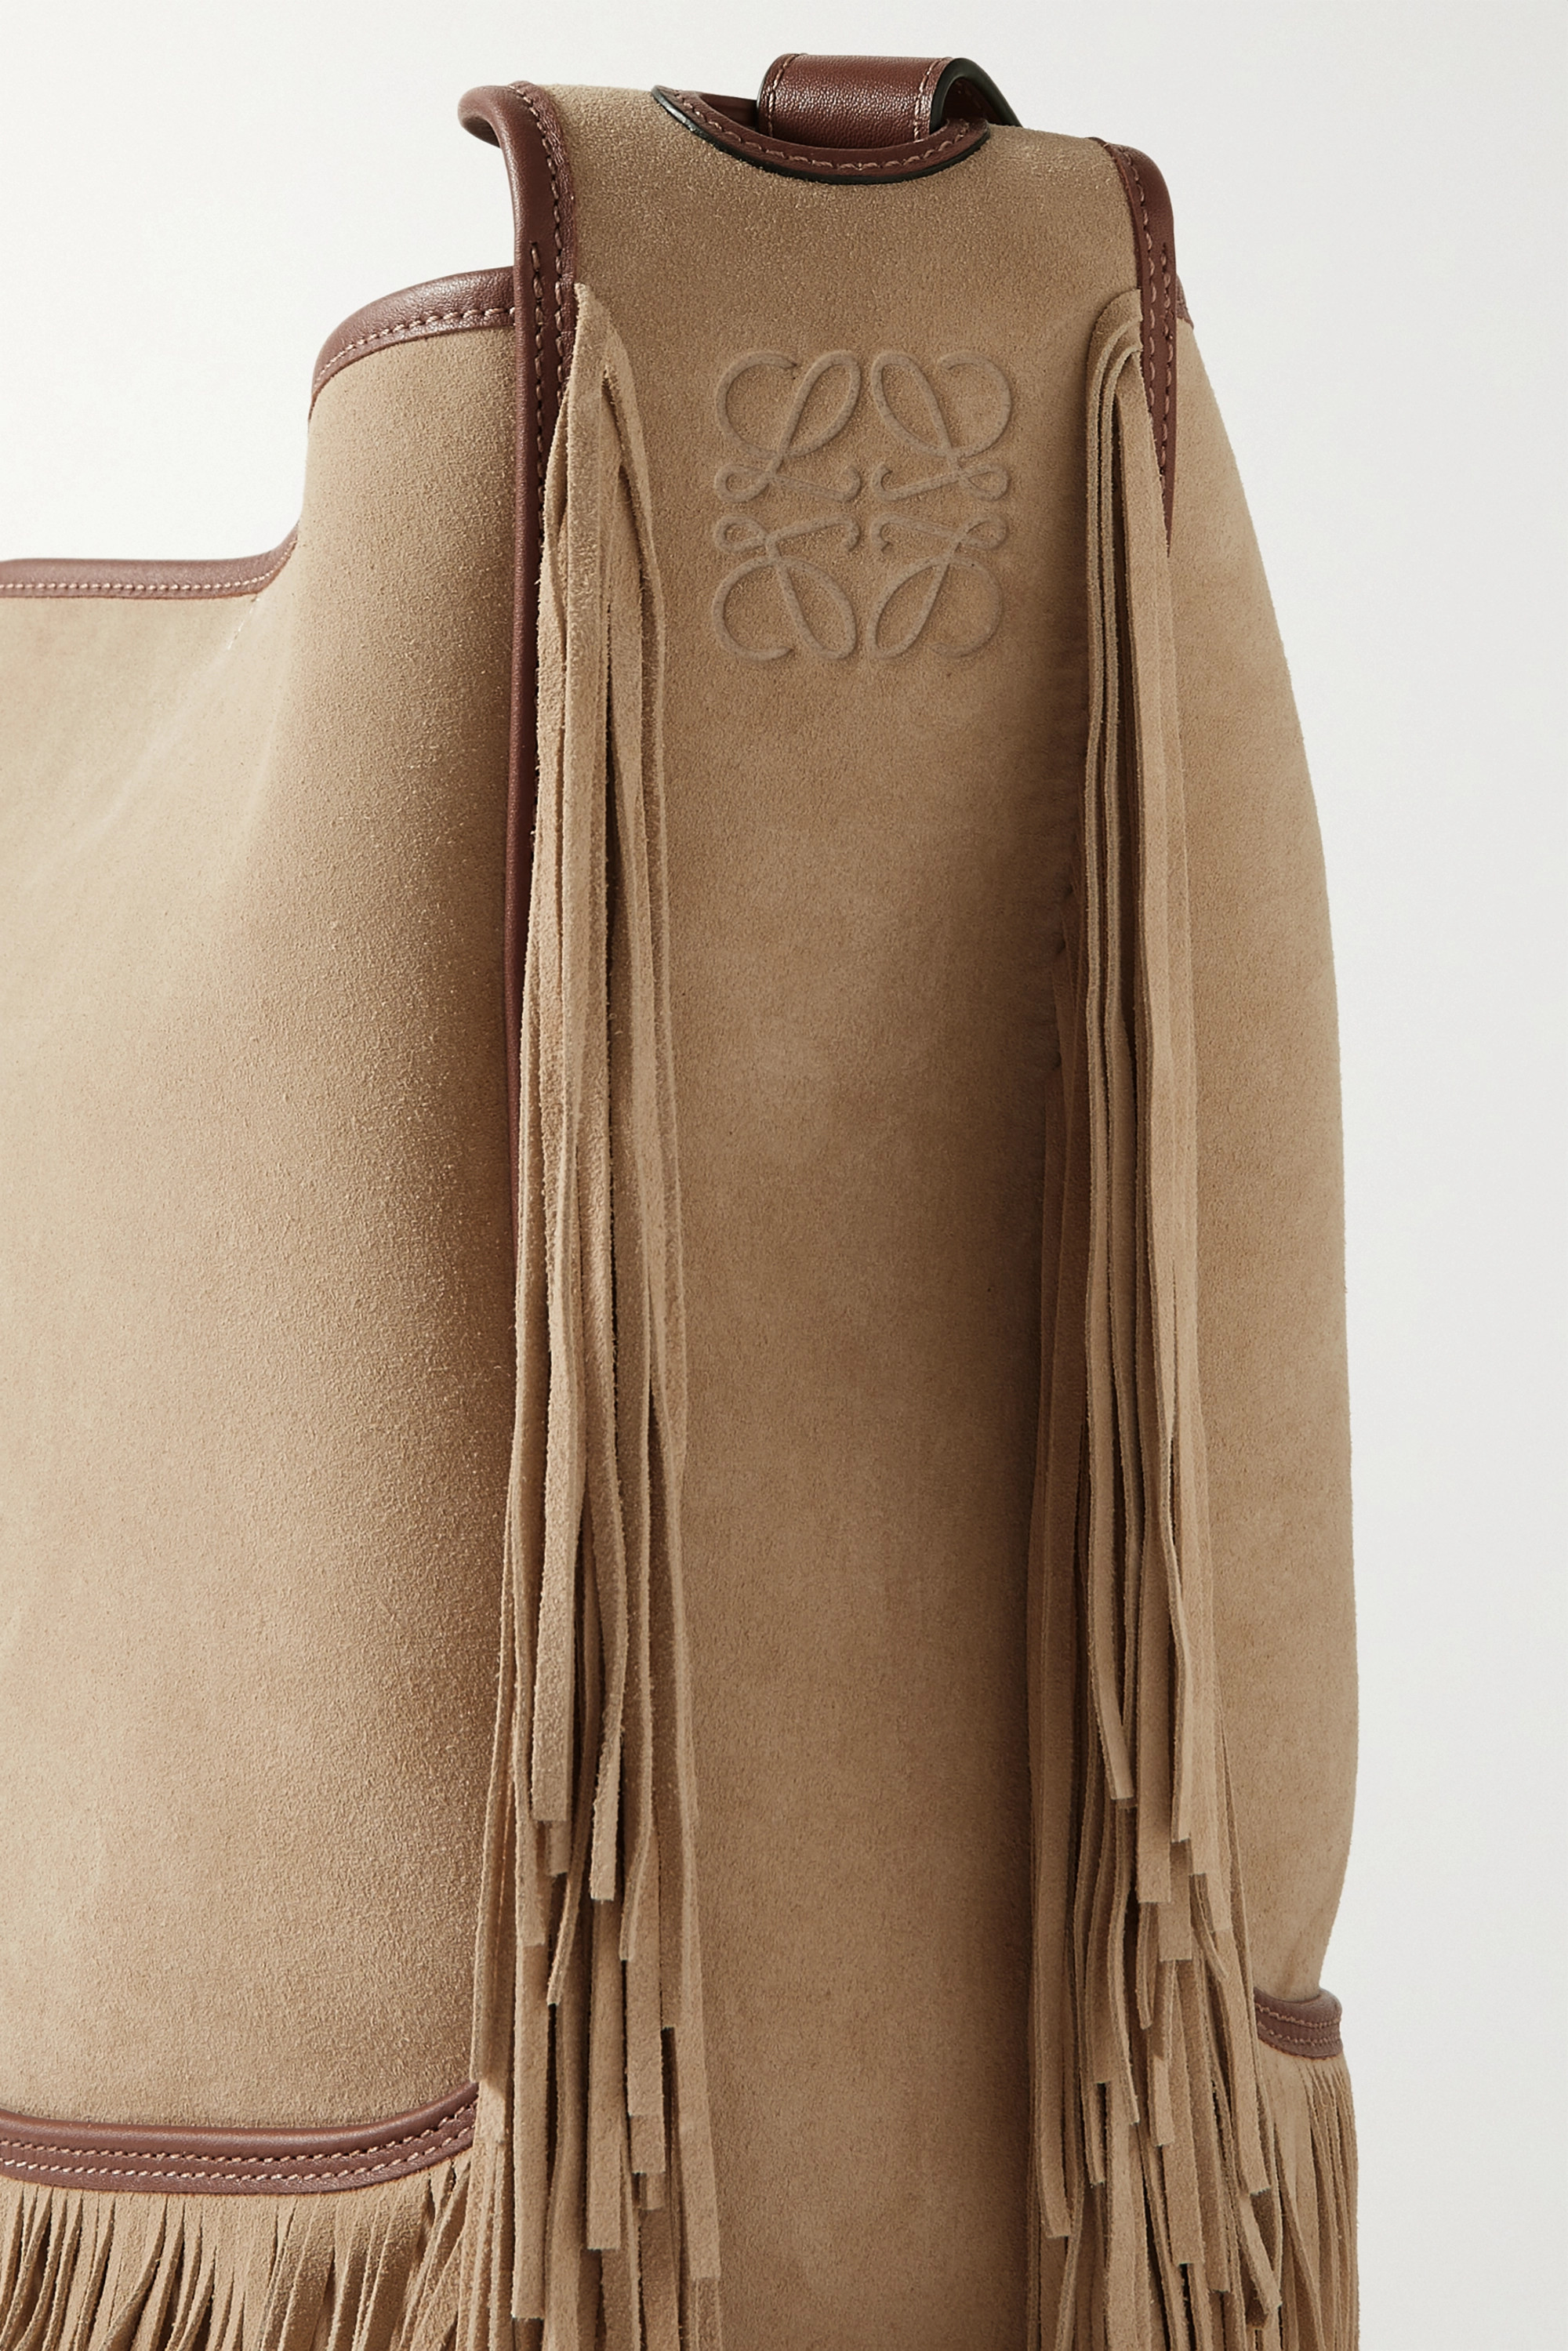 Loewe + Paula's Ibiza Balloon leather-trimmed fringed suede bucket bag